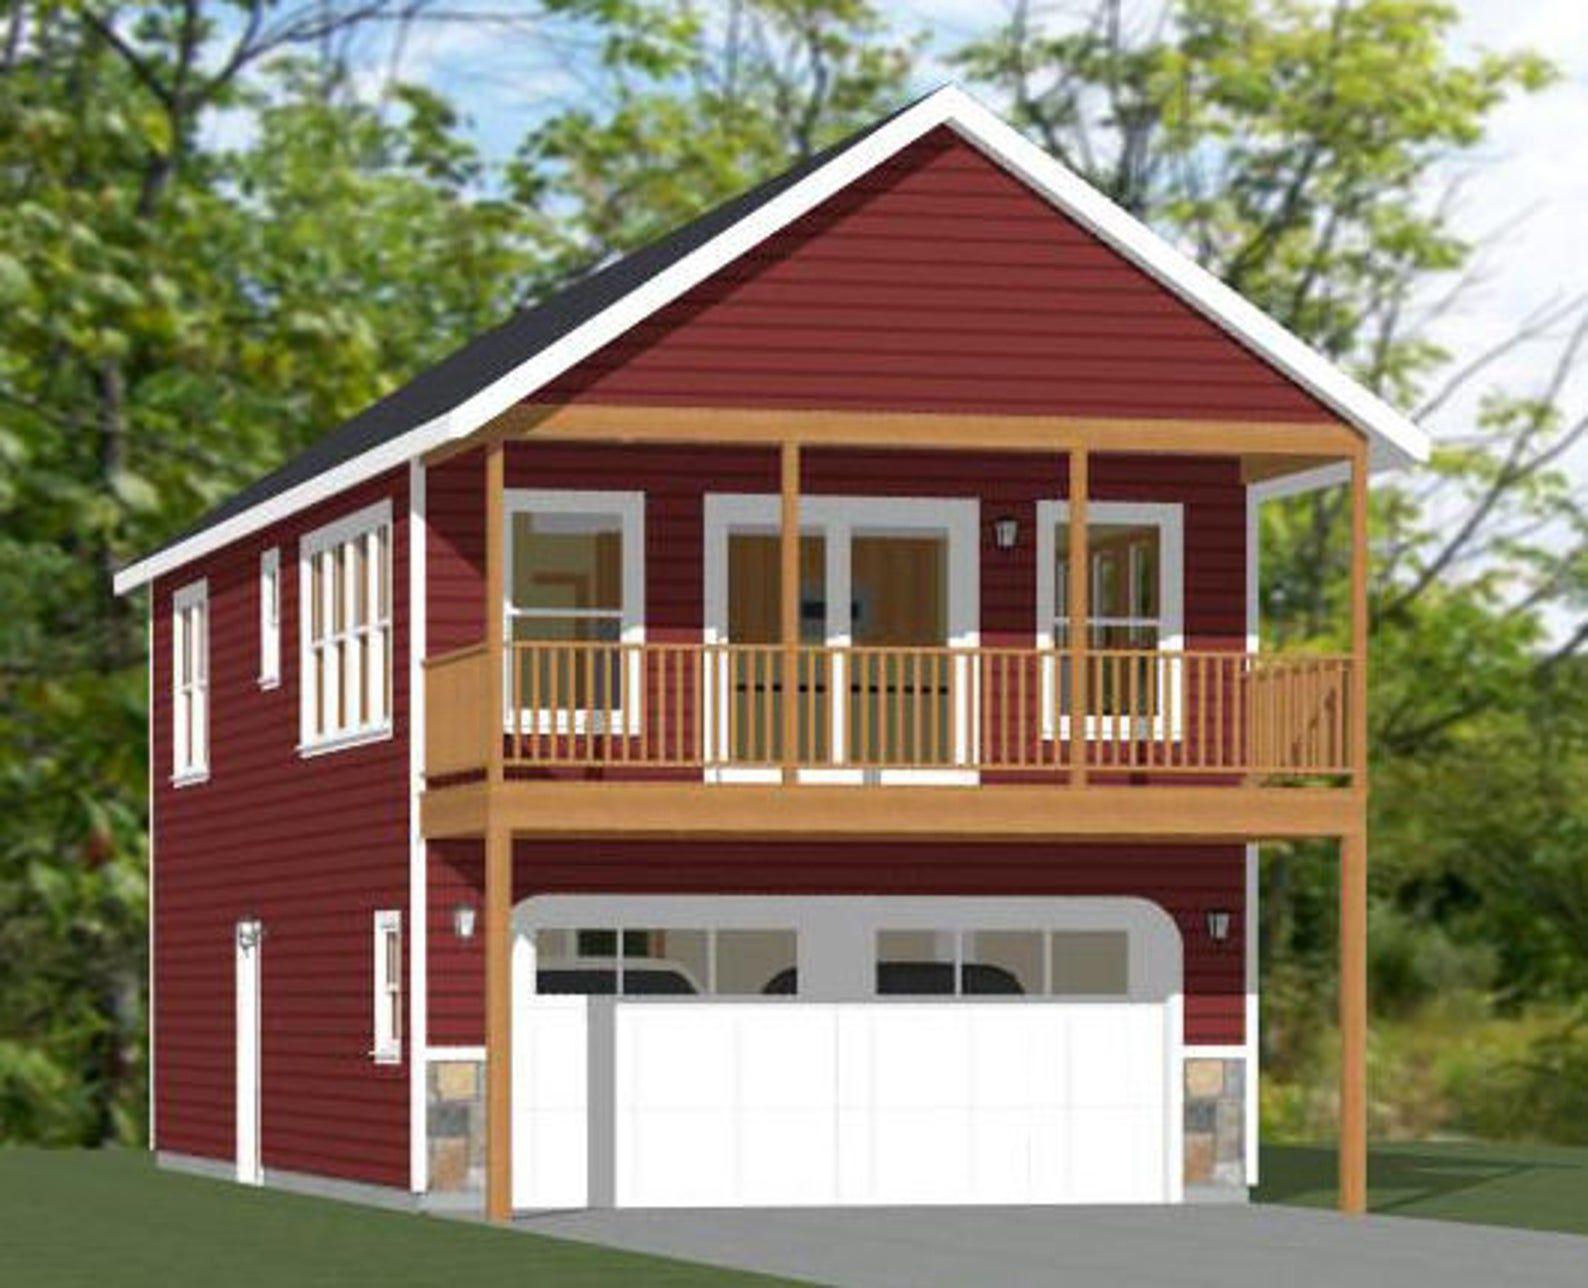 20x40 House 1 Bedroom 1.5 Bath 965 sq ft PDF Floor Etsy